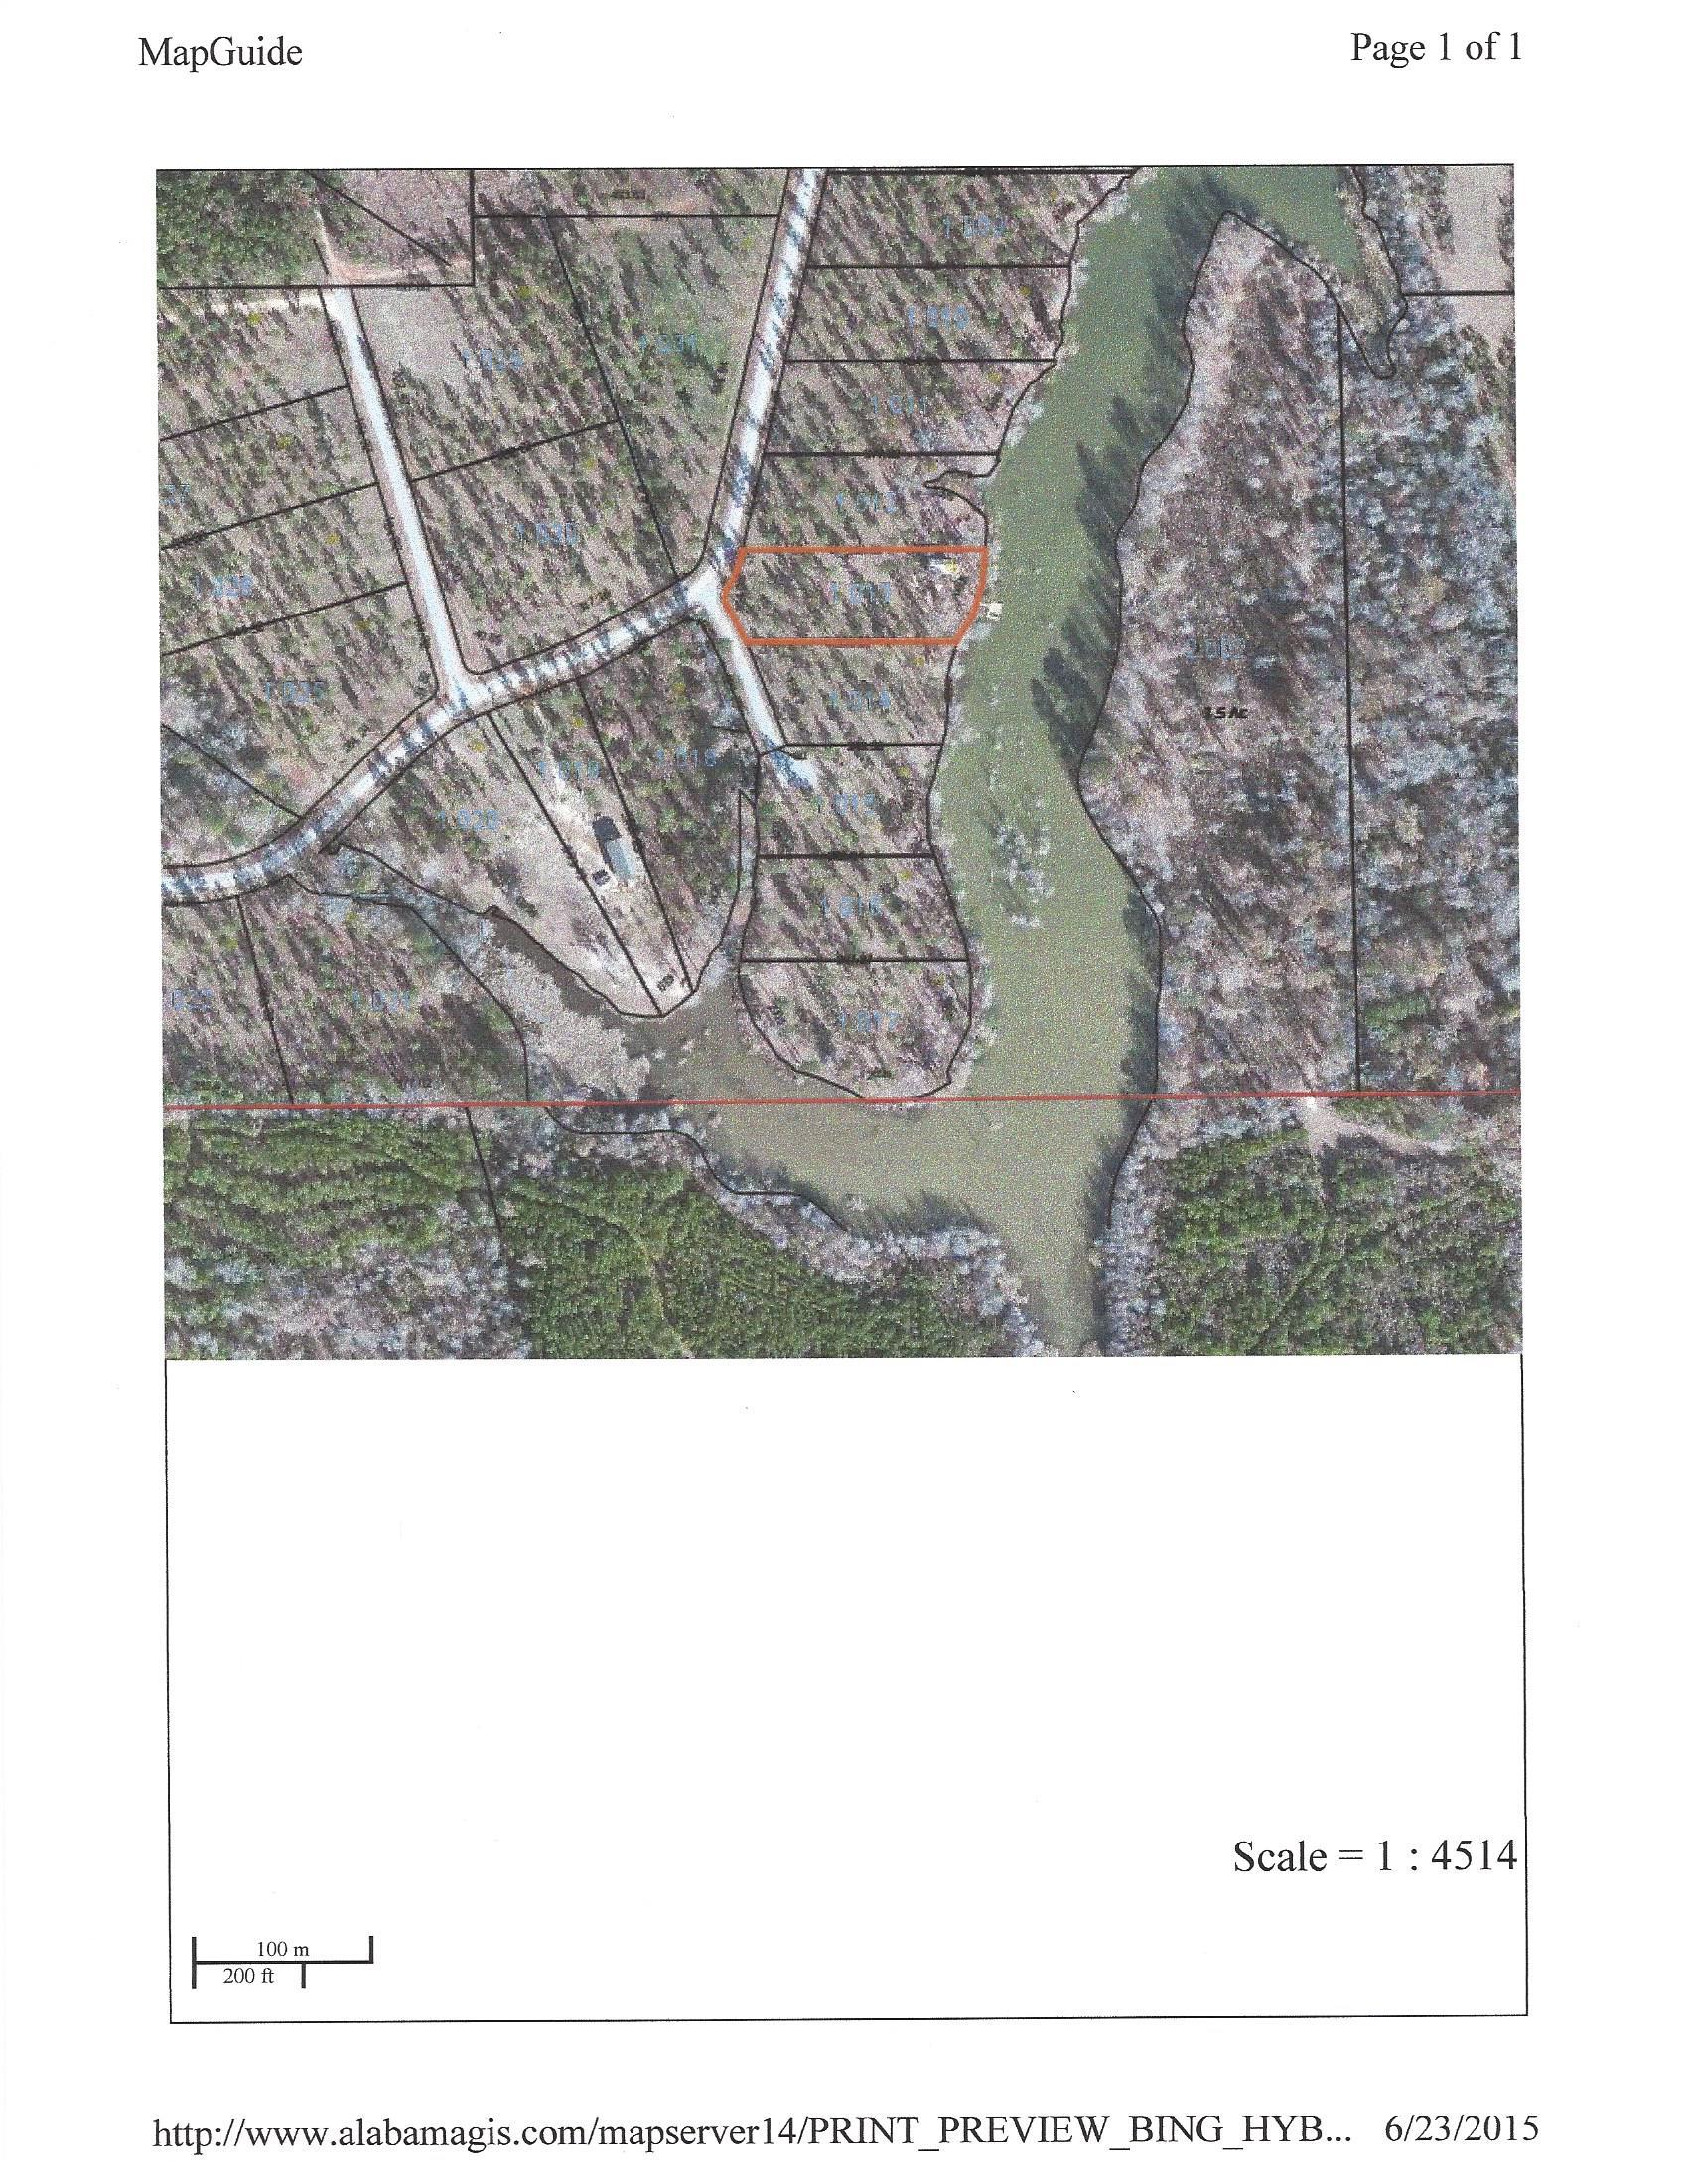 Alabama wilcox county catherine - The Cove Aerial Plat Jpg